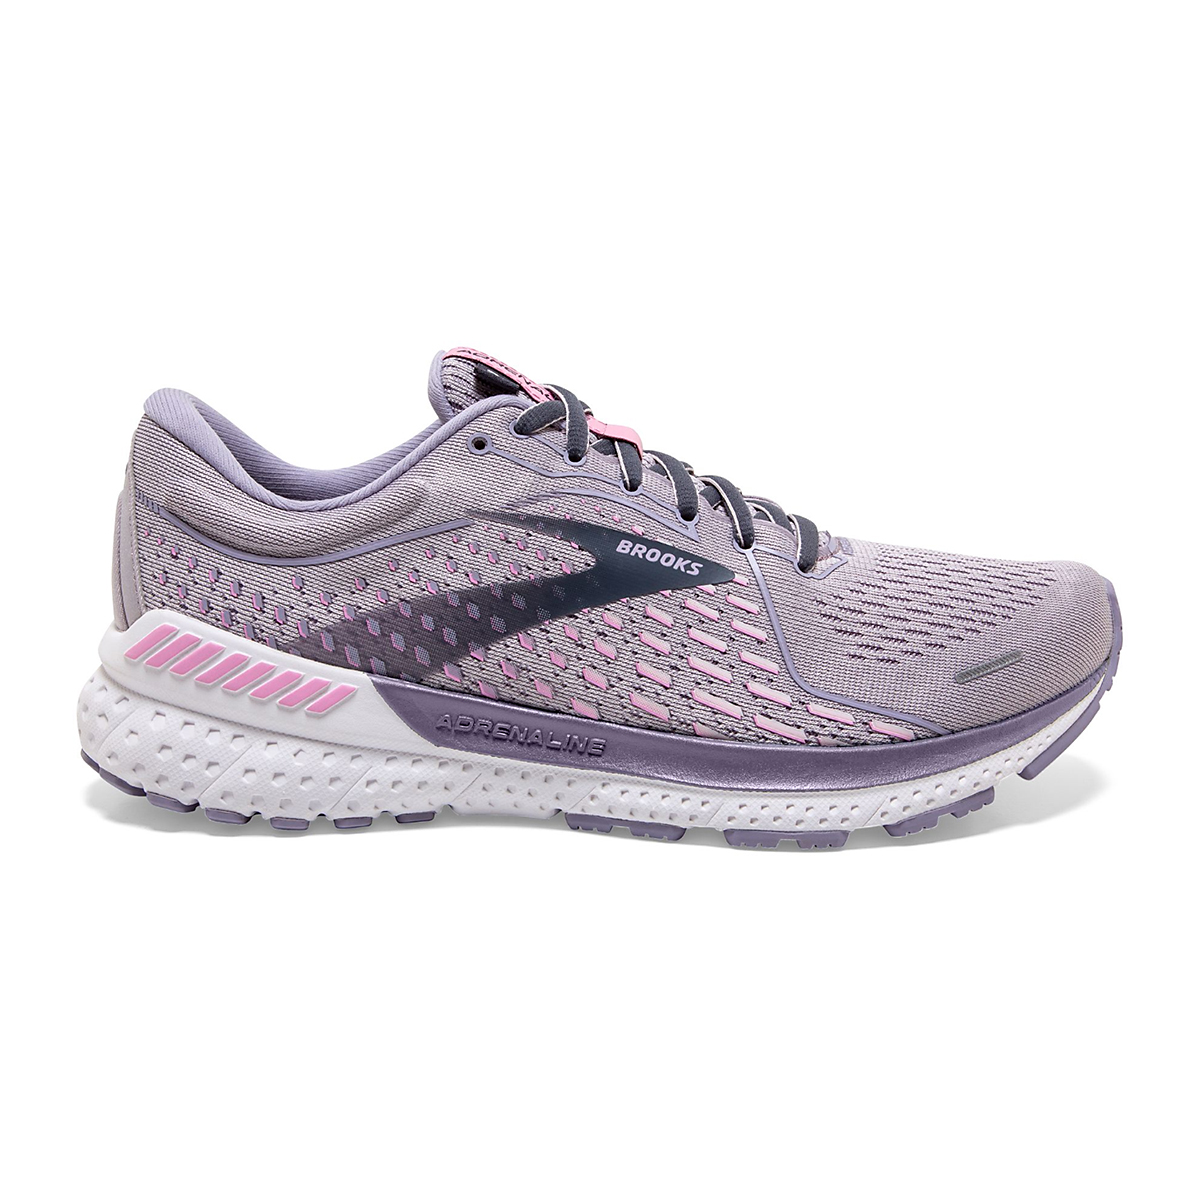 Women's Brooks Adrenaline GTS 21 Running Shoe - Color: Iris/Lilac  - Size: 5 - Width: Regular, Iris/Lilac, large, image 1